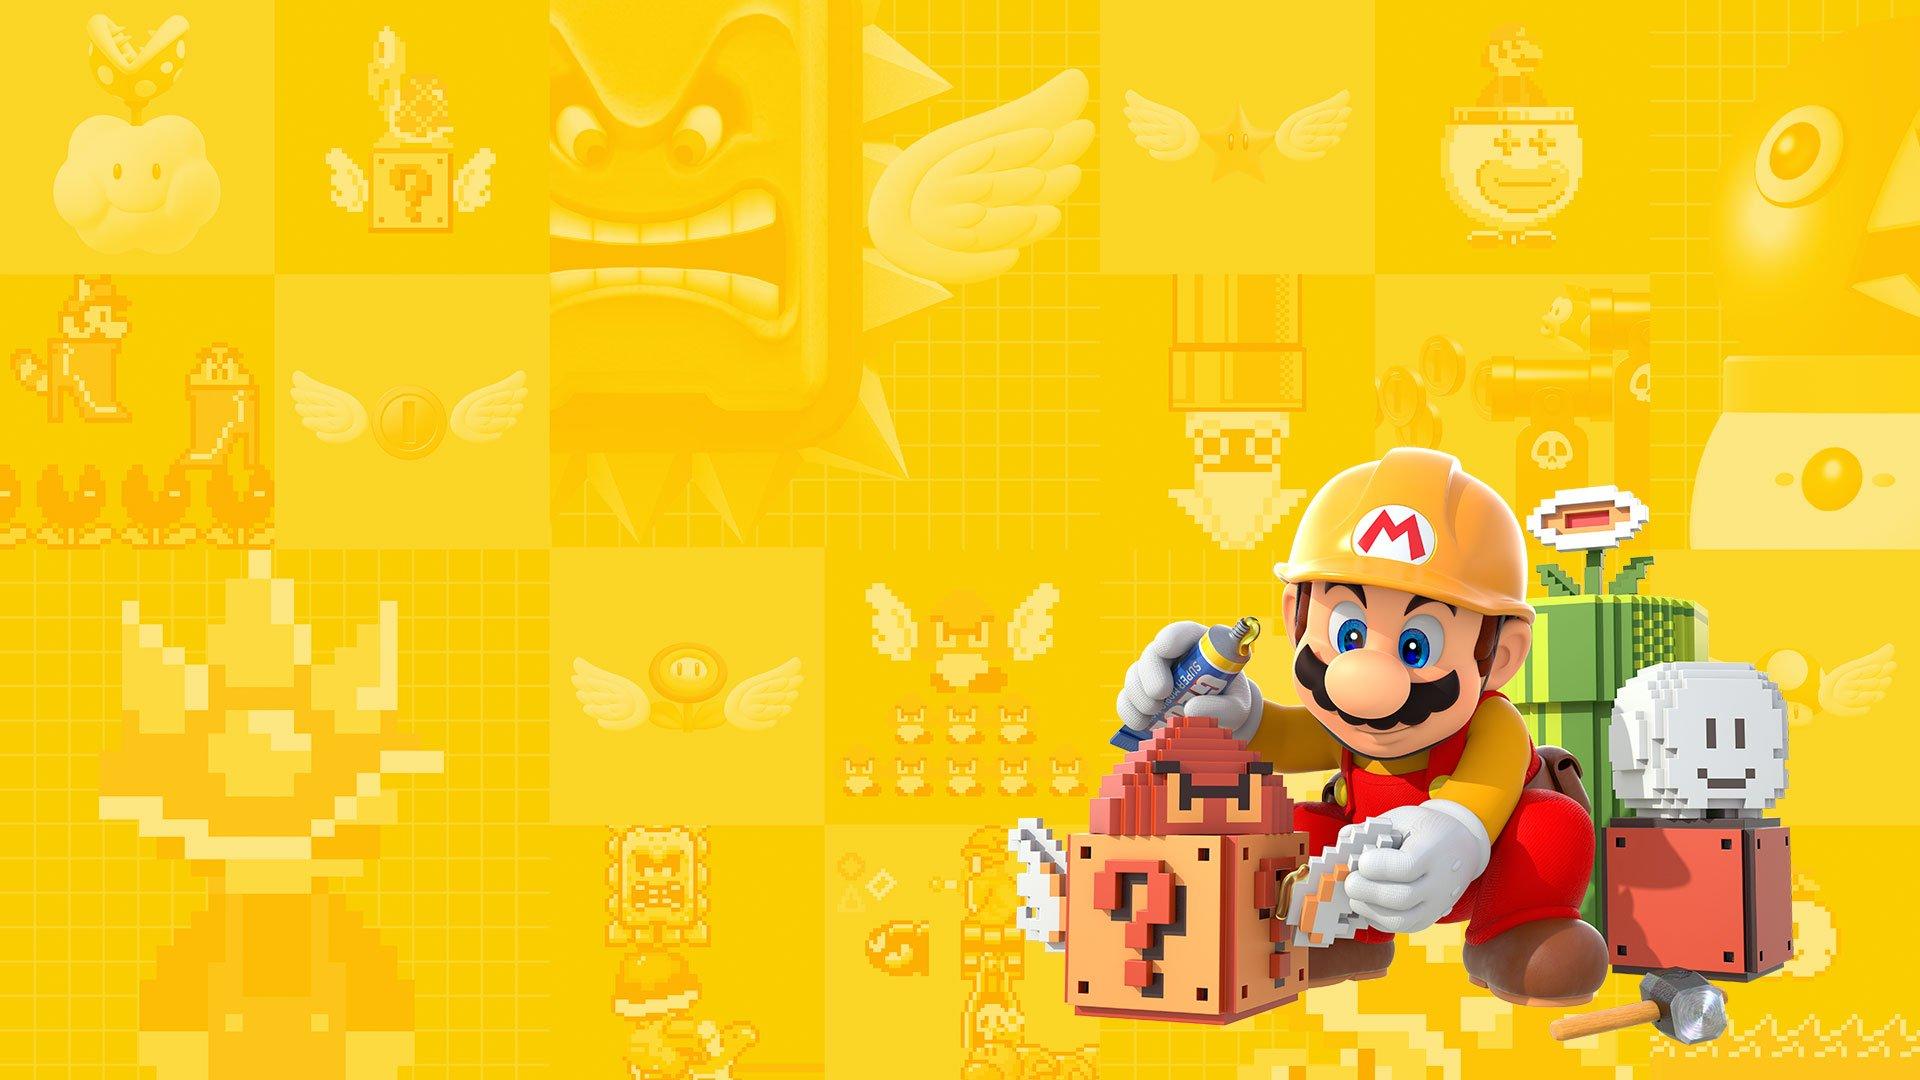 'Super Mario Maker' Is A Brilliant Entry In The Super Mario Series